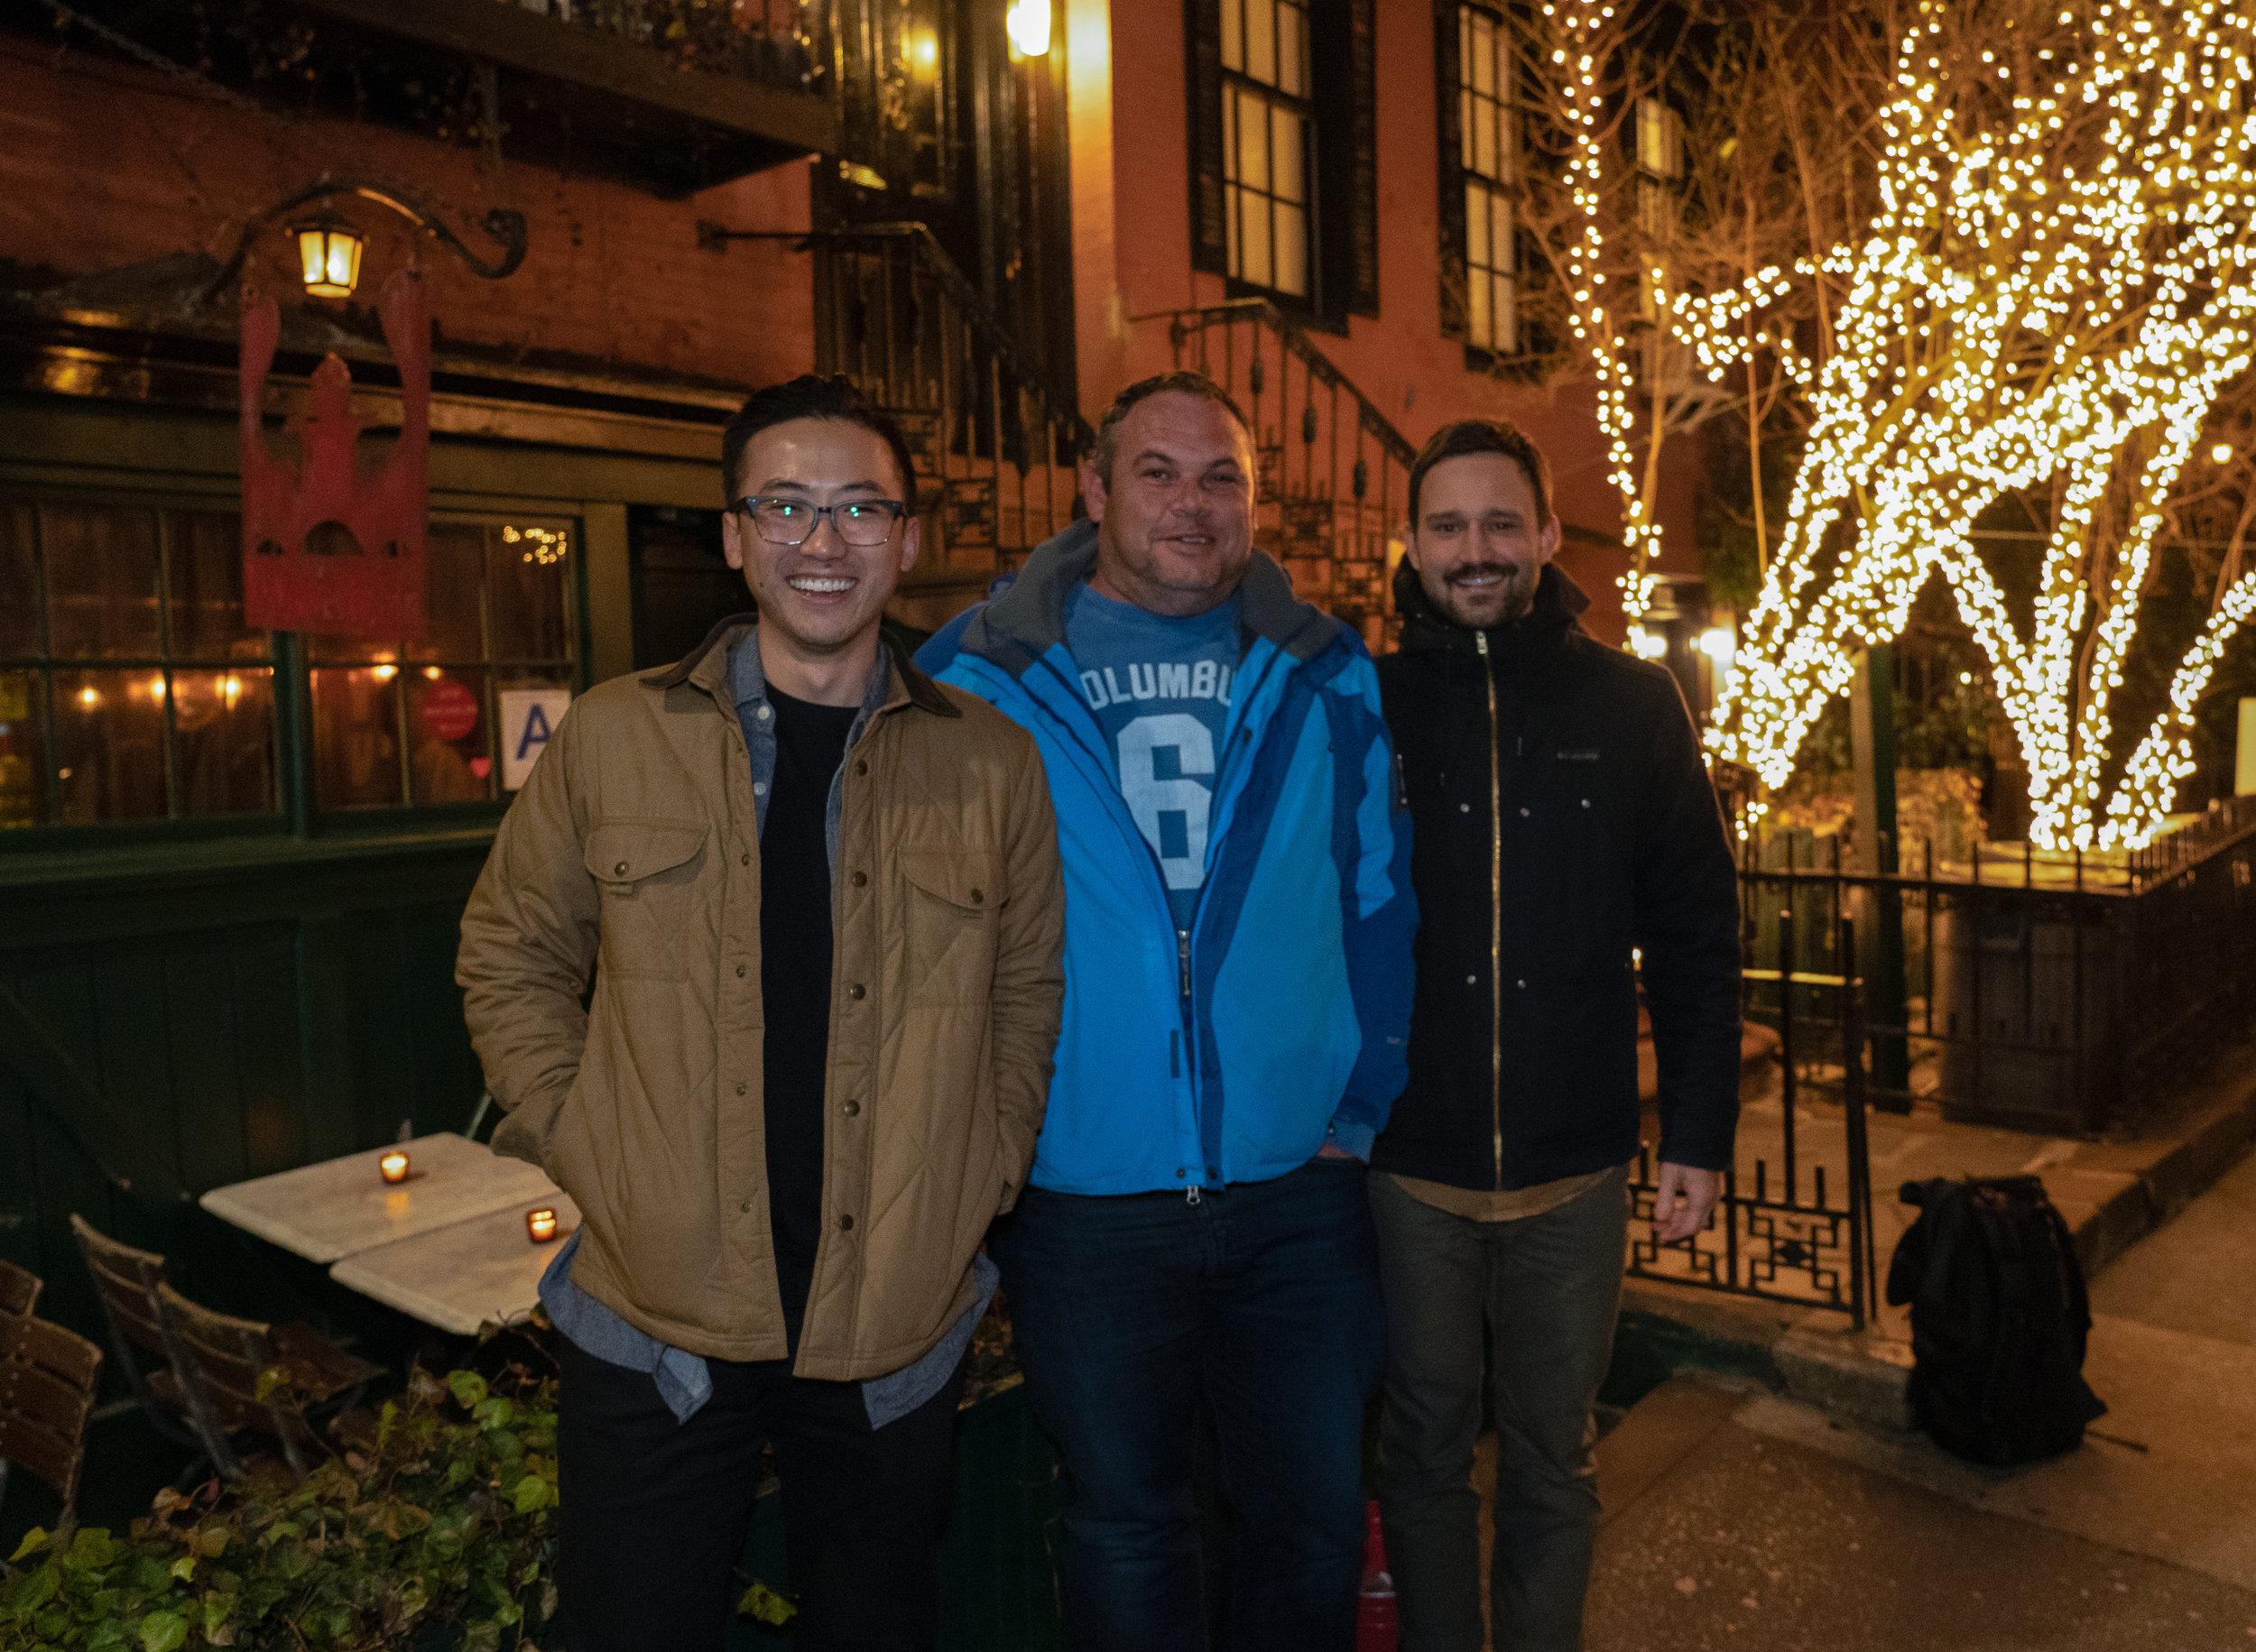 James Liu, Alwyn Naude Jr., and Nathanael Stanek in New York City.